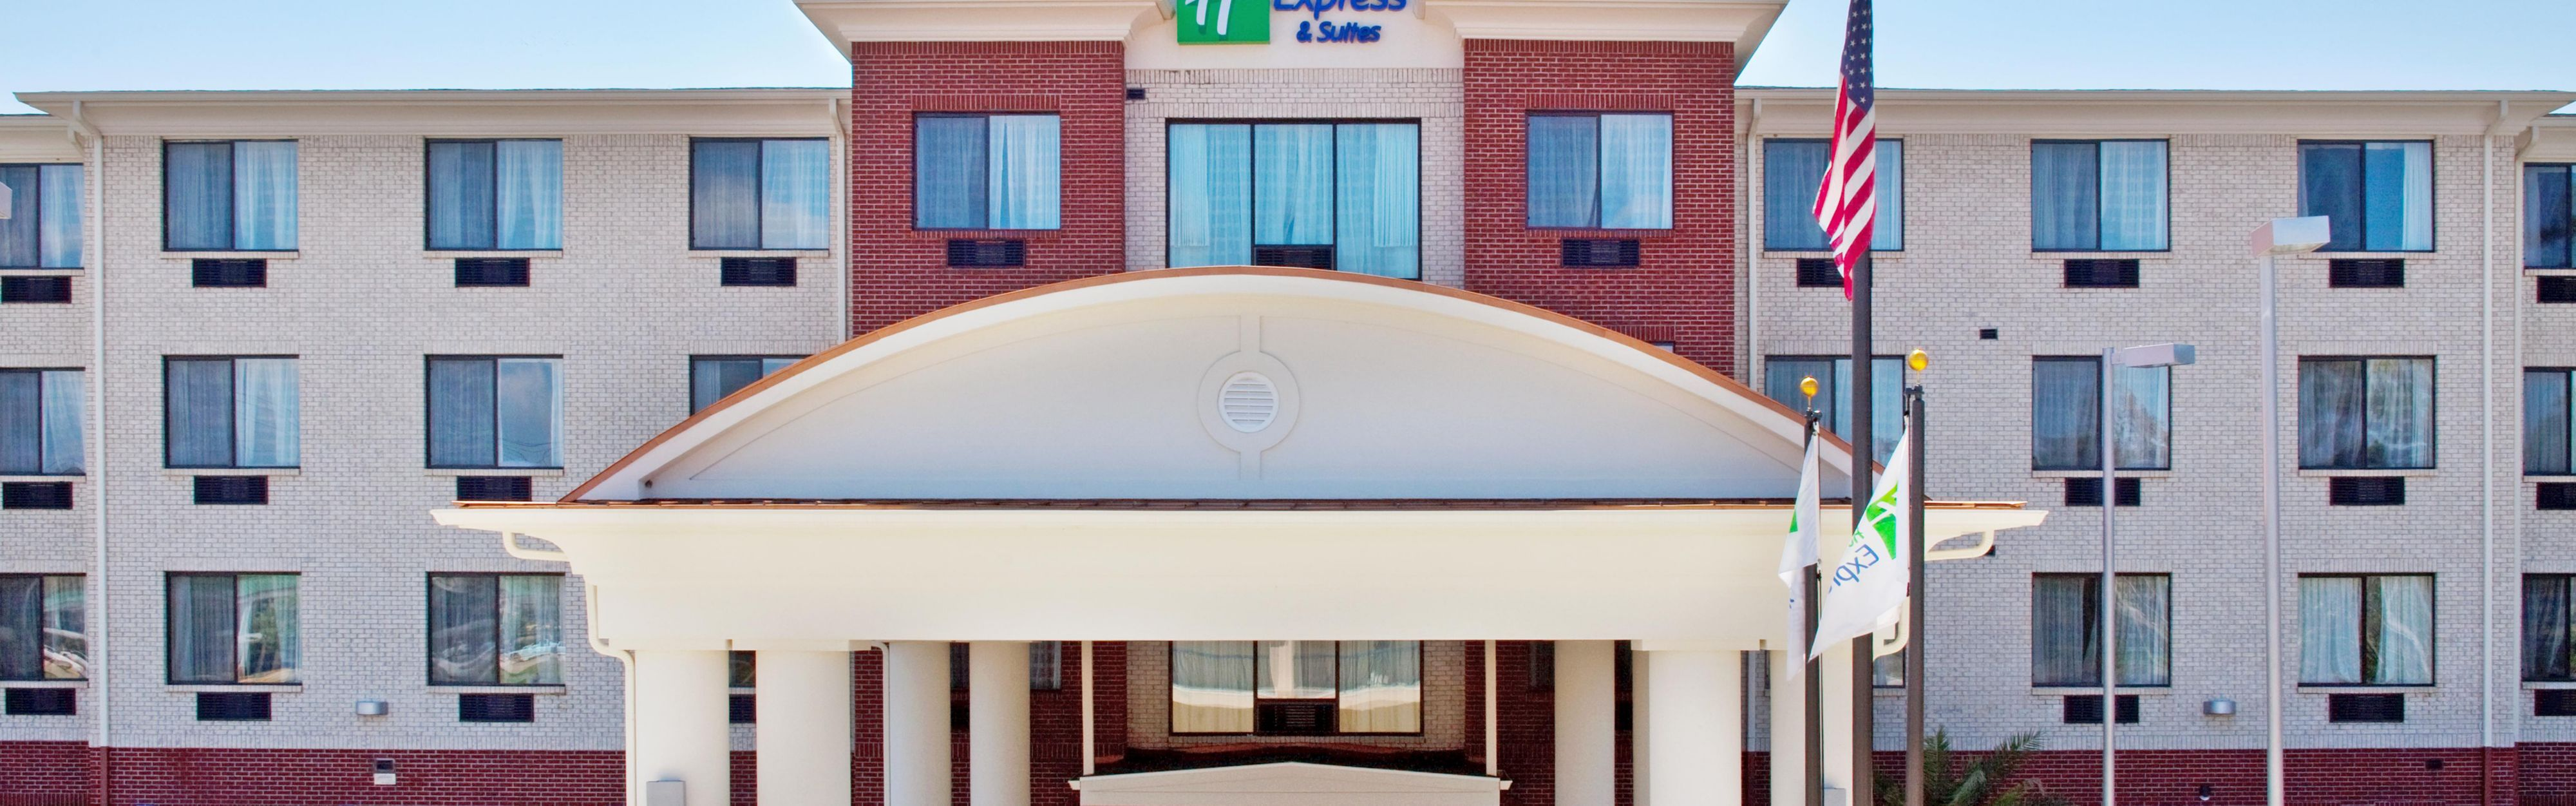 Holiday Inn Express & Suites Biloxi- Ocean Springs image 0